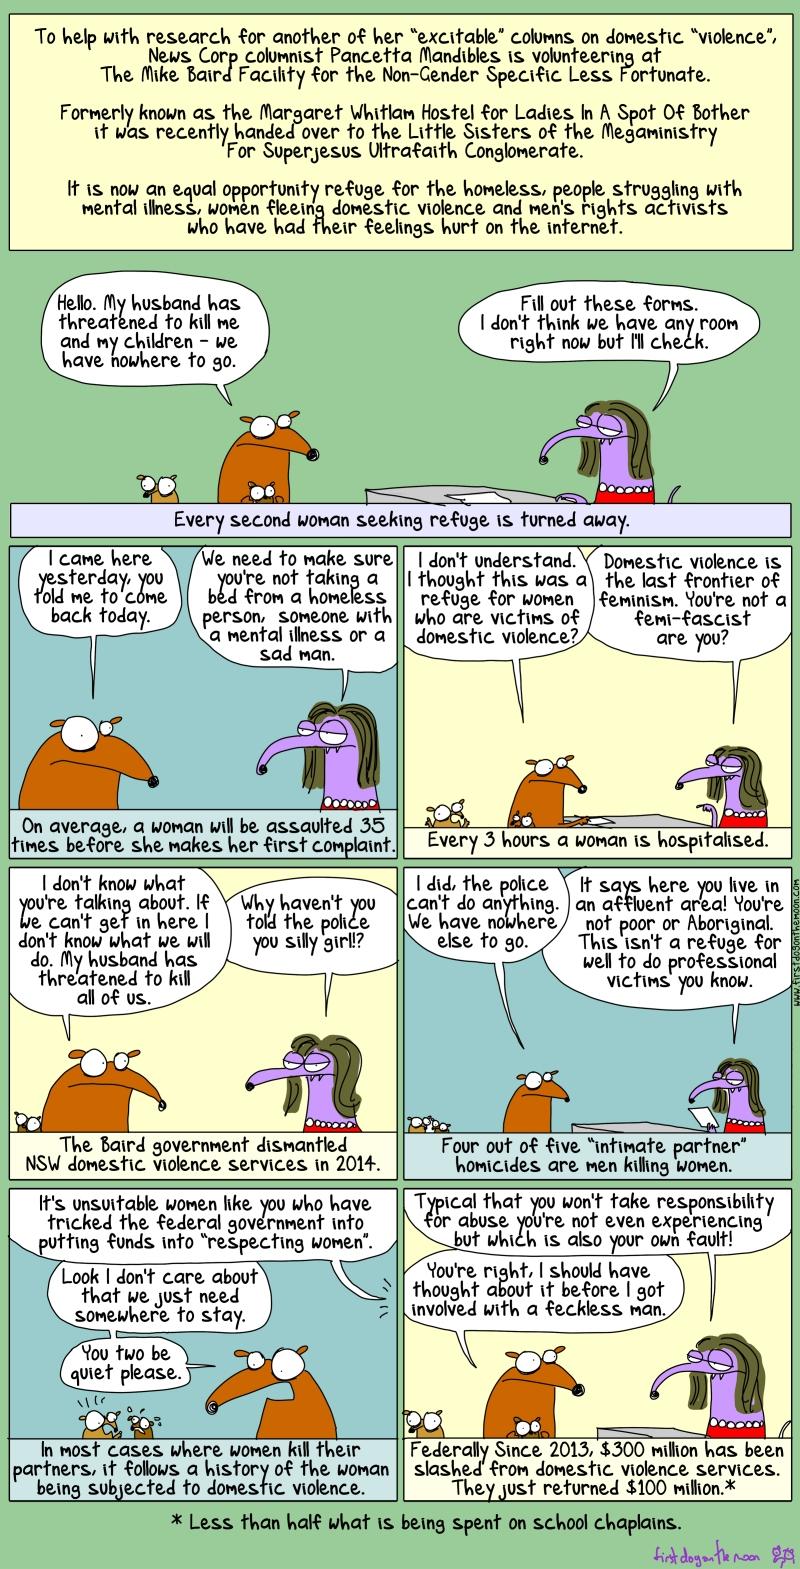 First Dog on the Moon - Cartoon 1